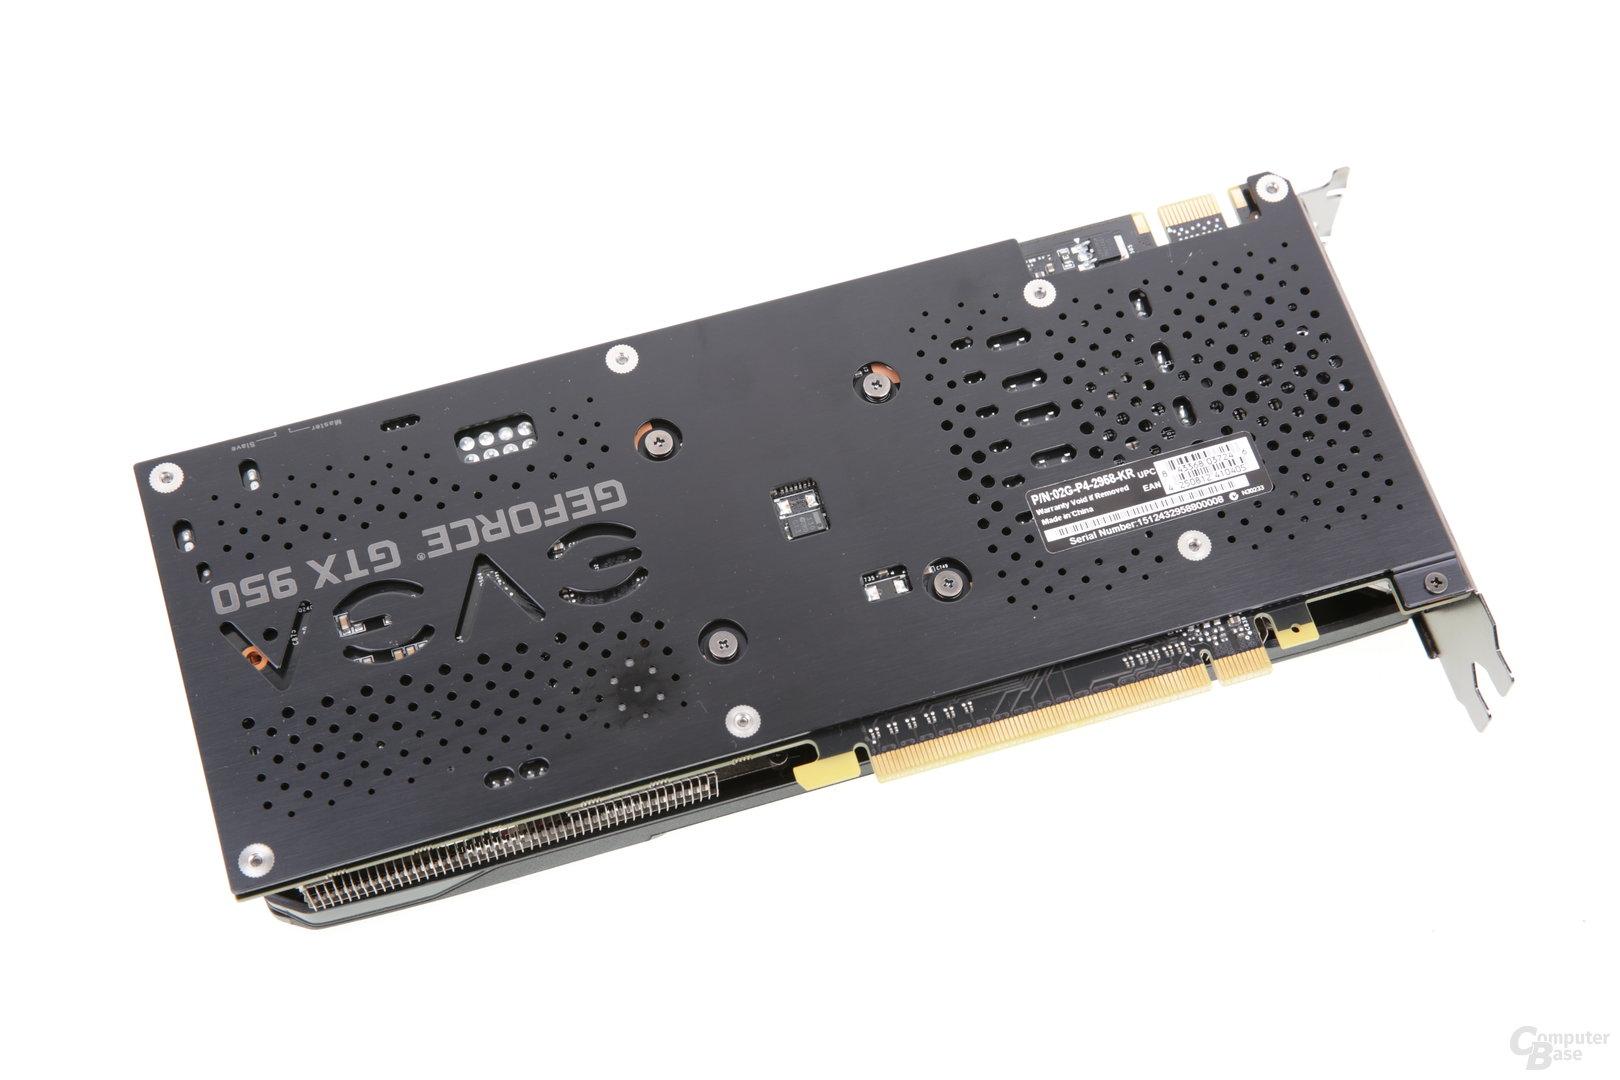 EVGA GeForce GTX 950 FTW - Rückseite